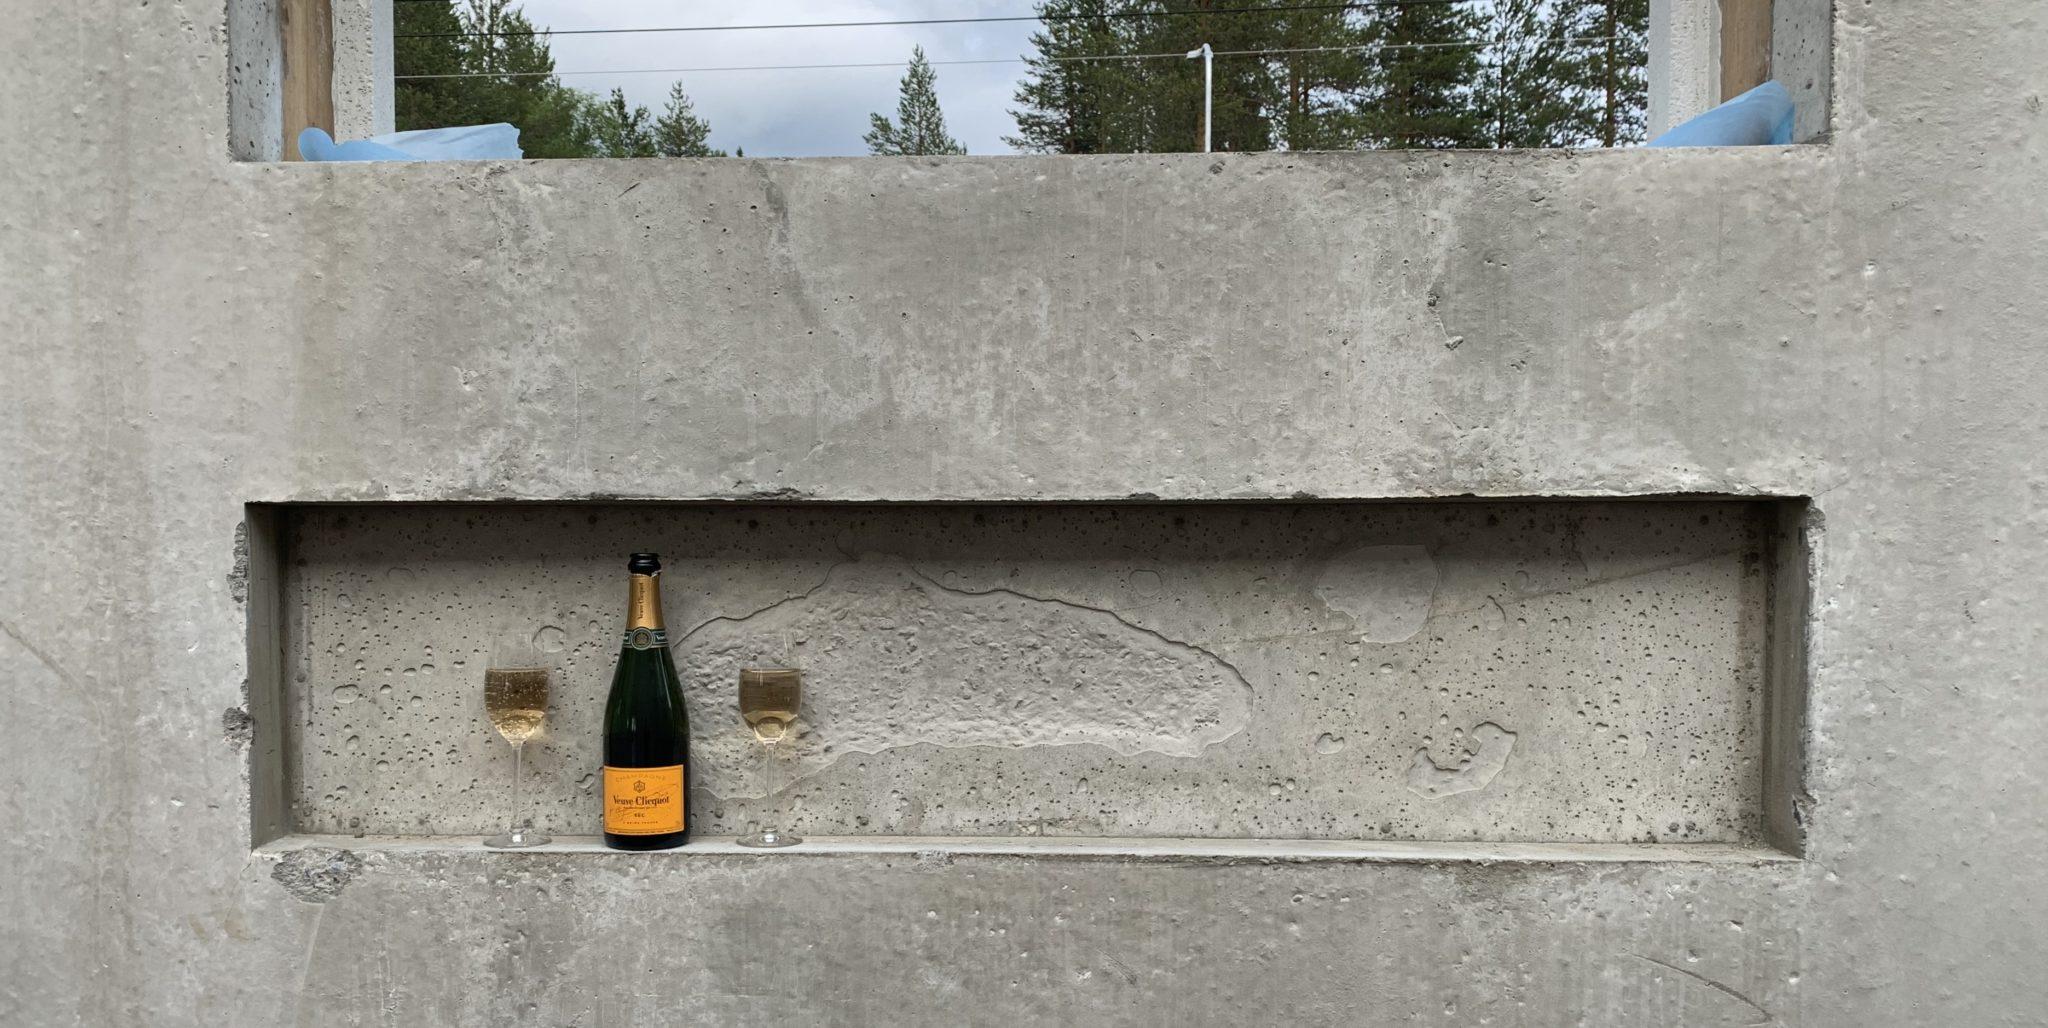 Veuve Champagne Shampoosyvennös kylpyhuone Kivitalon rakentaminen